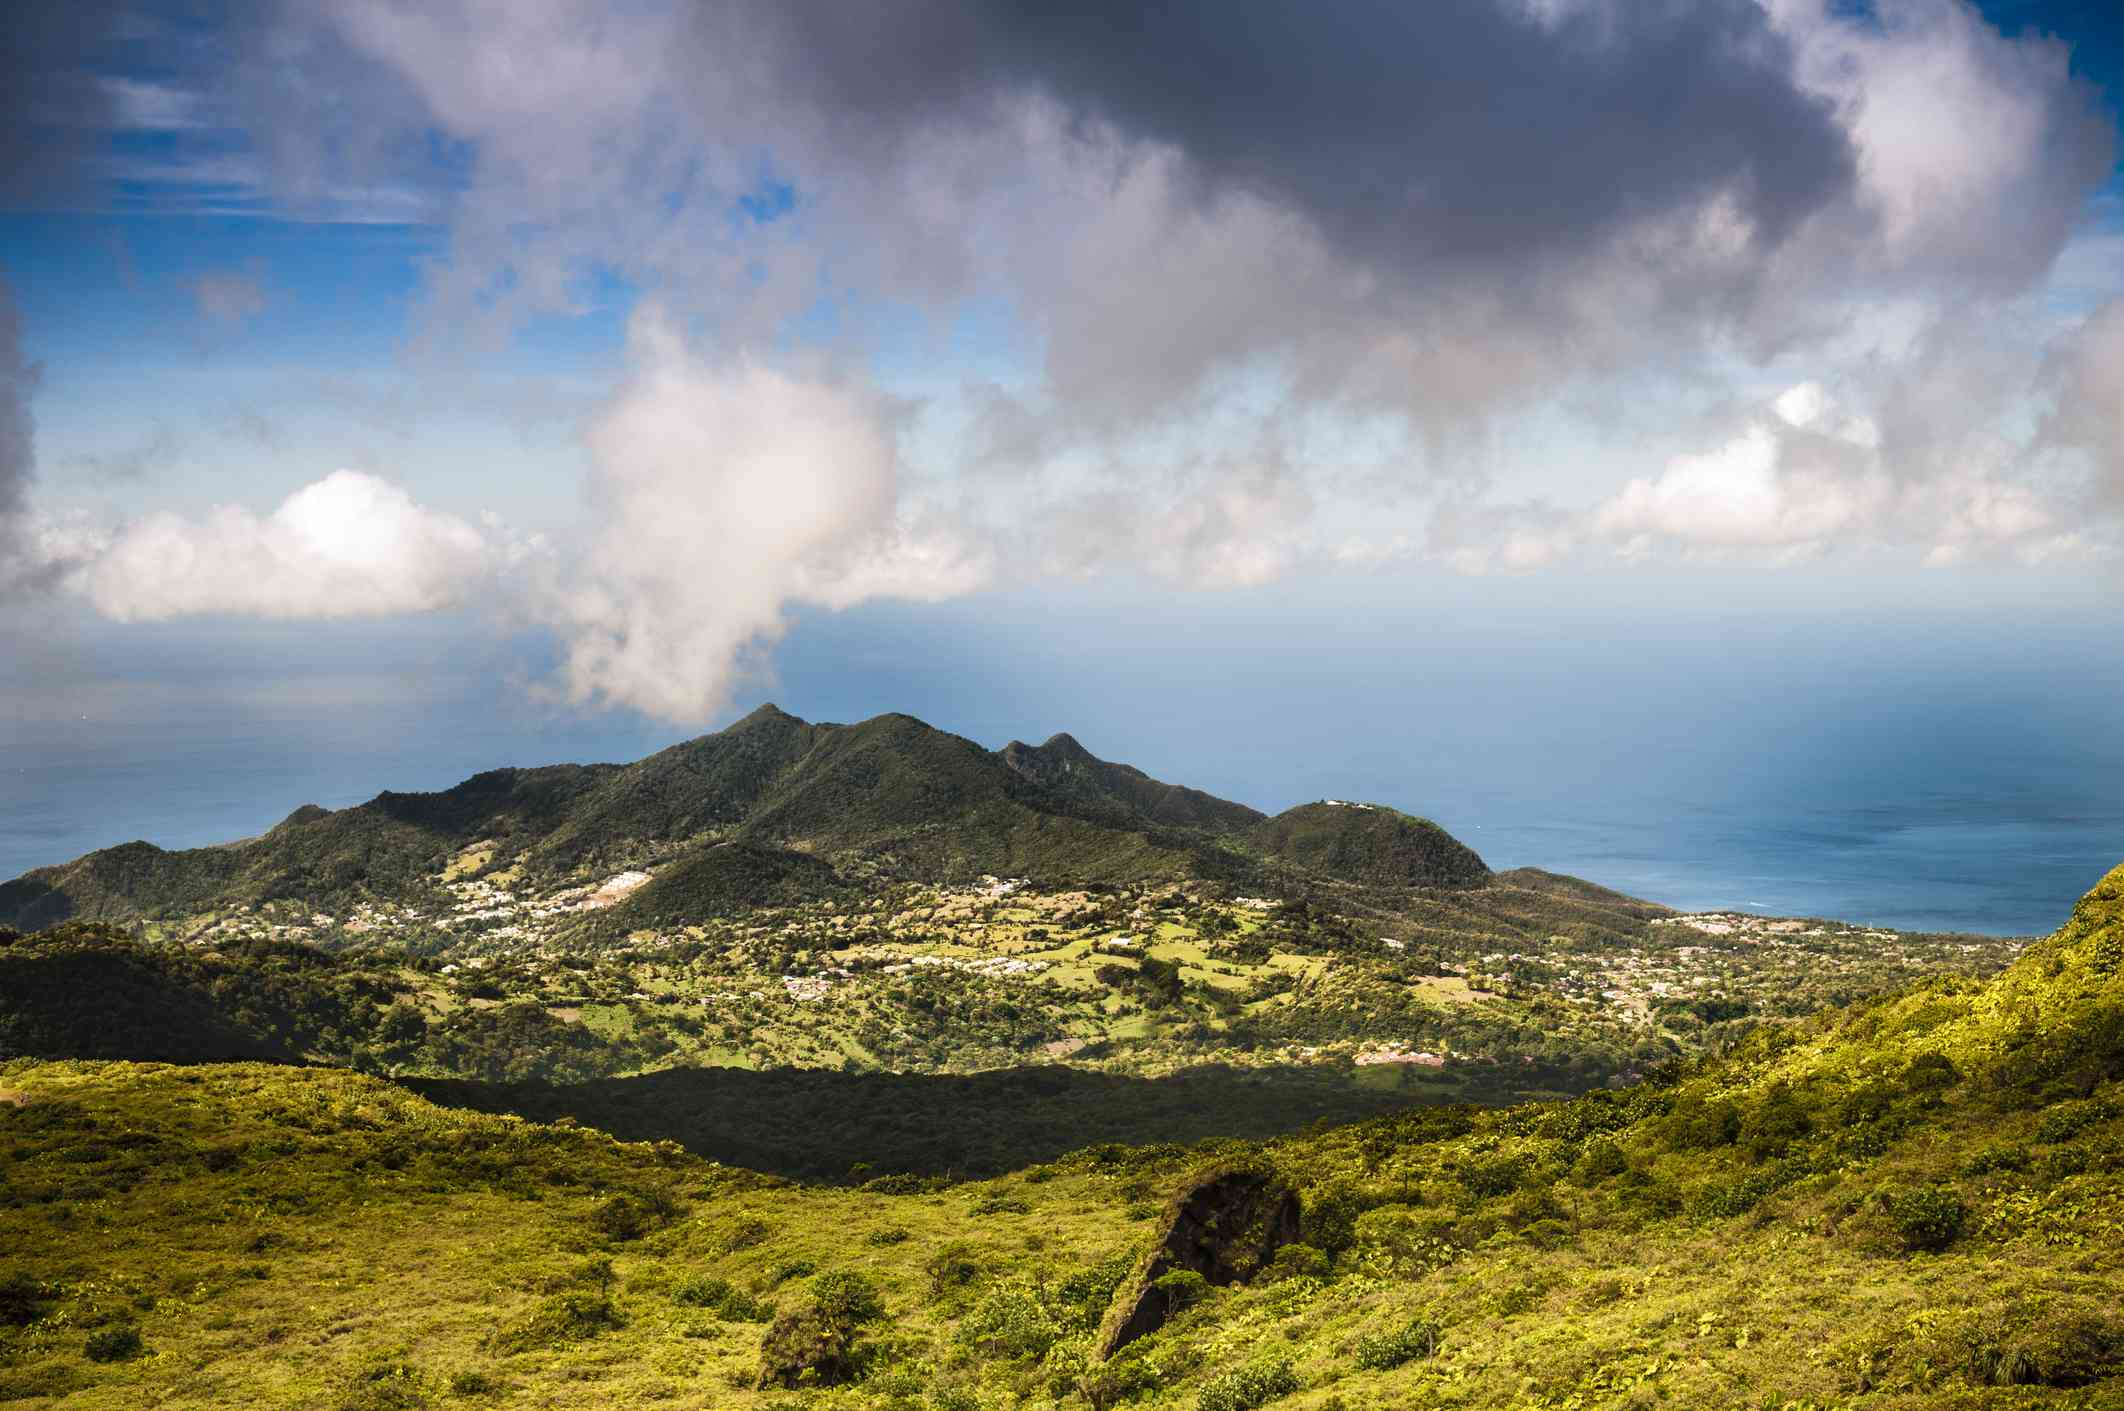 View of La Soufriere against the sky